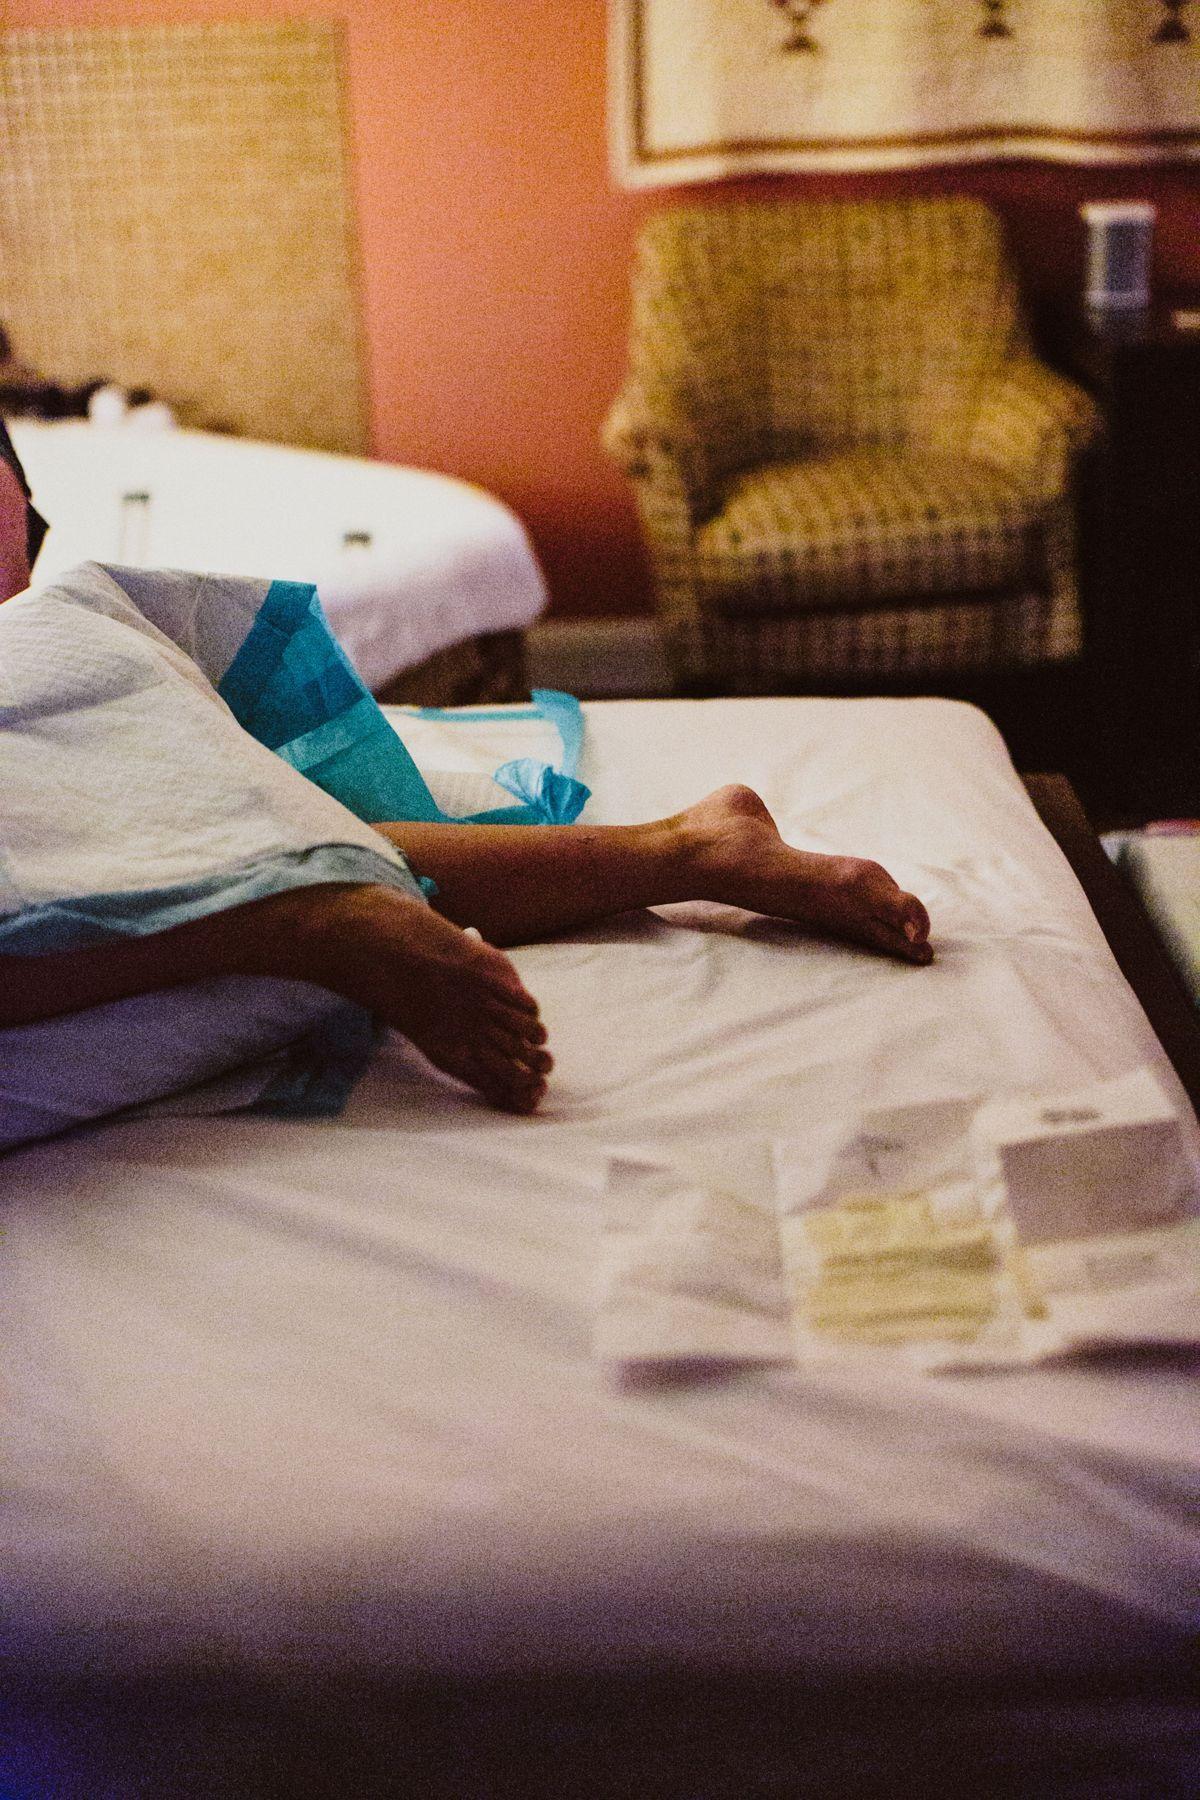 zada-junes-birth-story-at-austin-birthing-center-in-austin-tx-0004.jpg